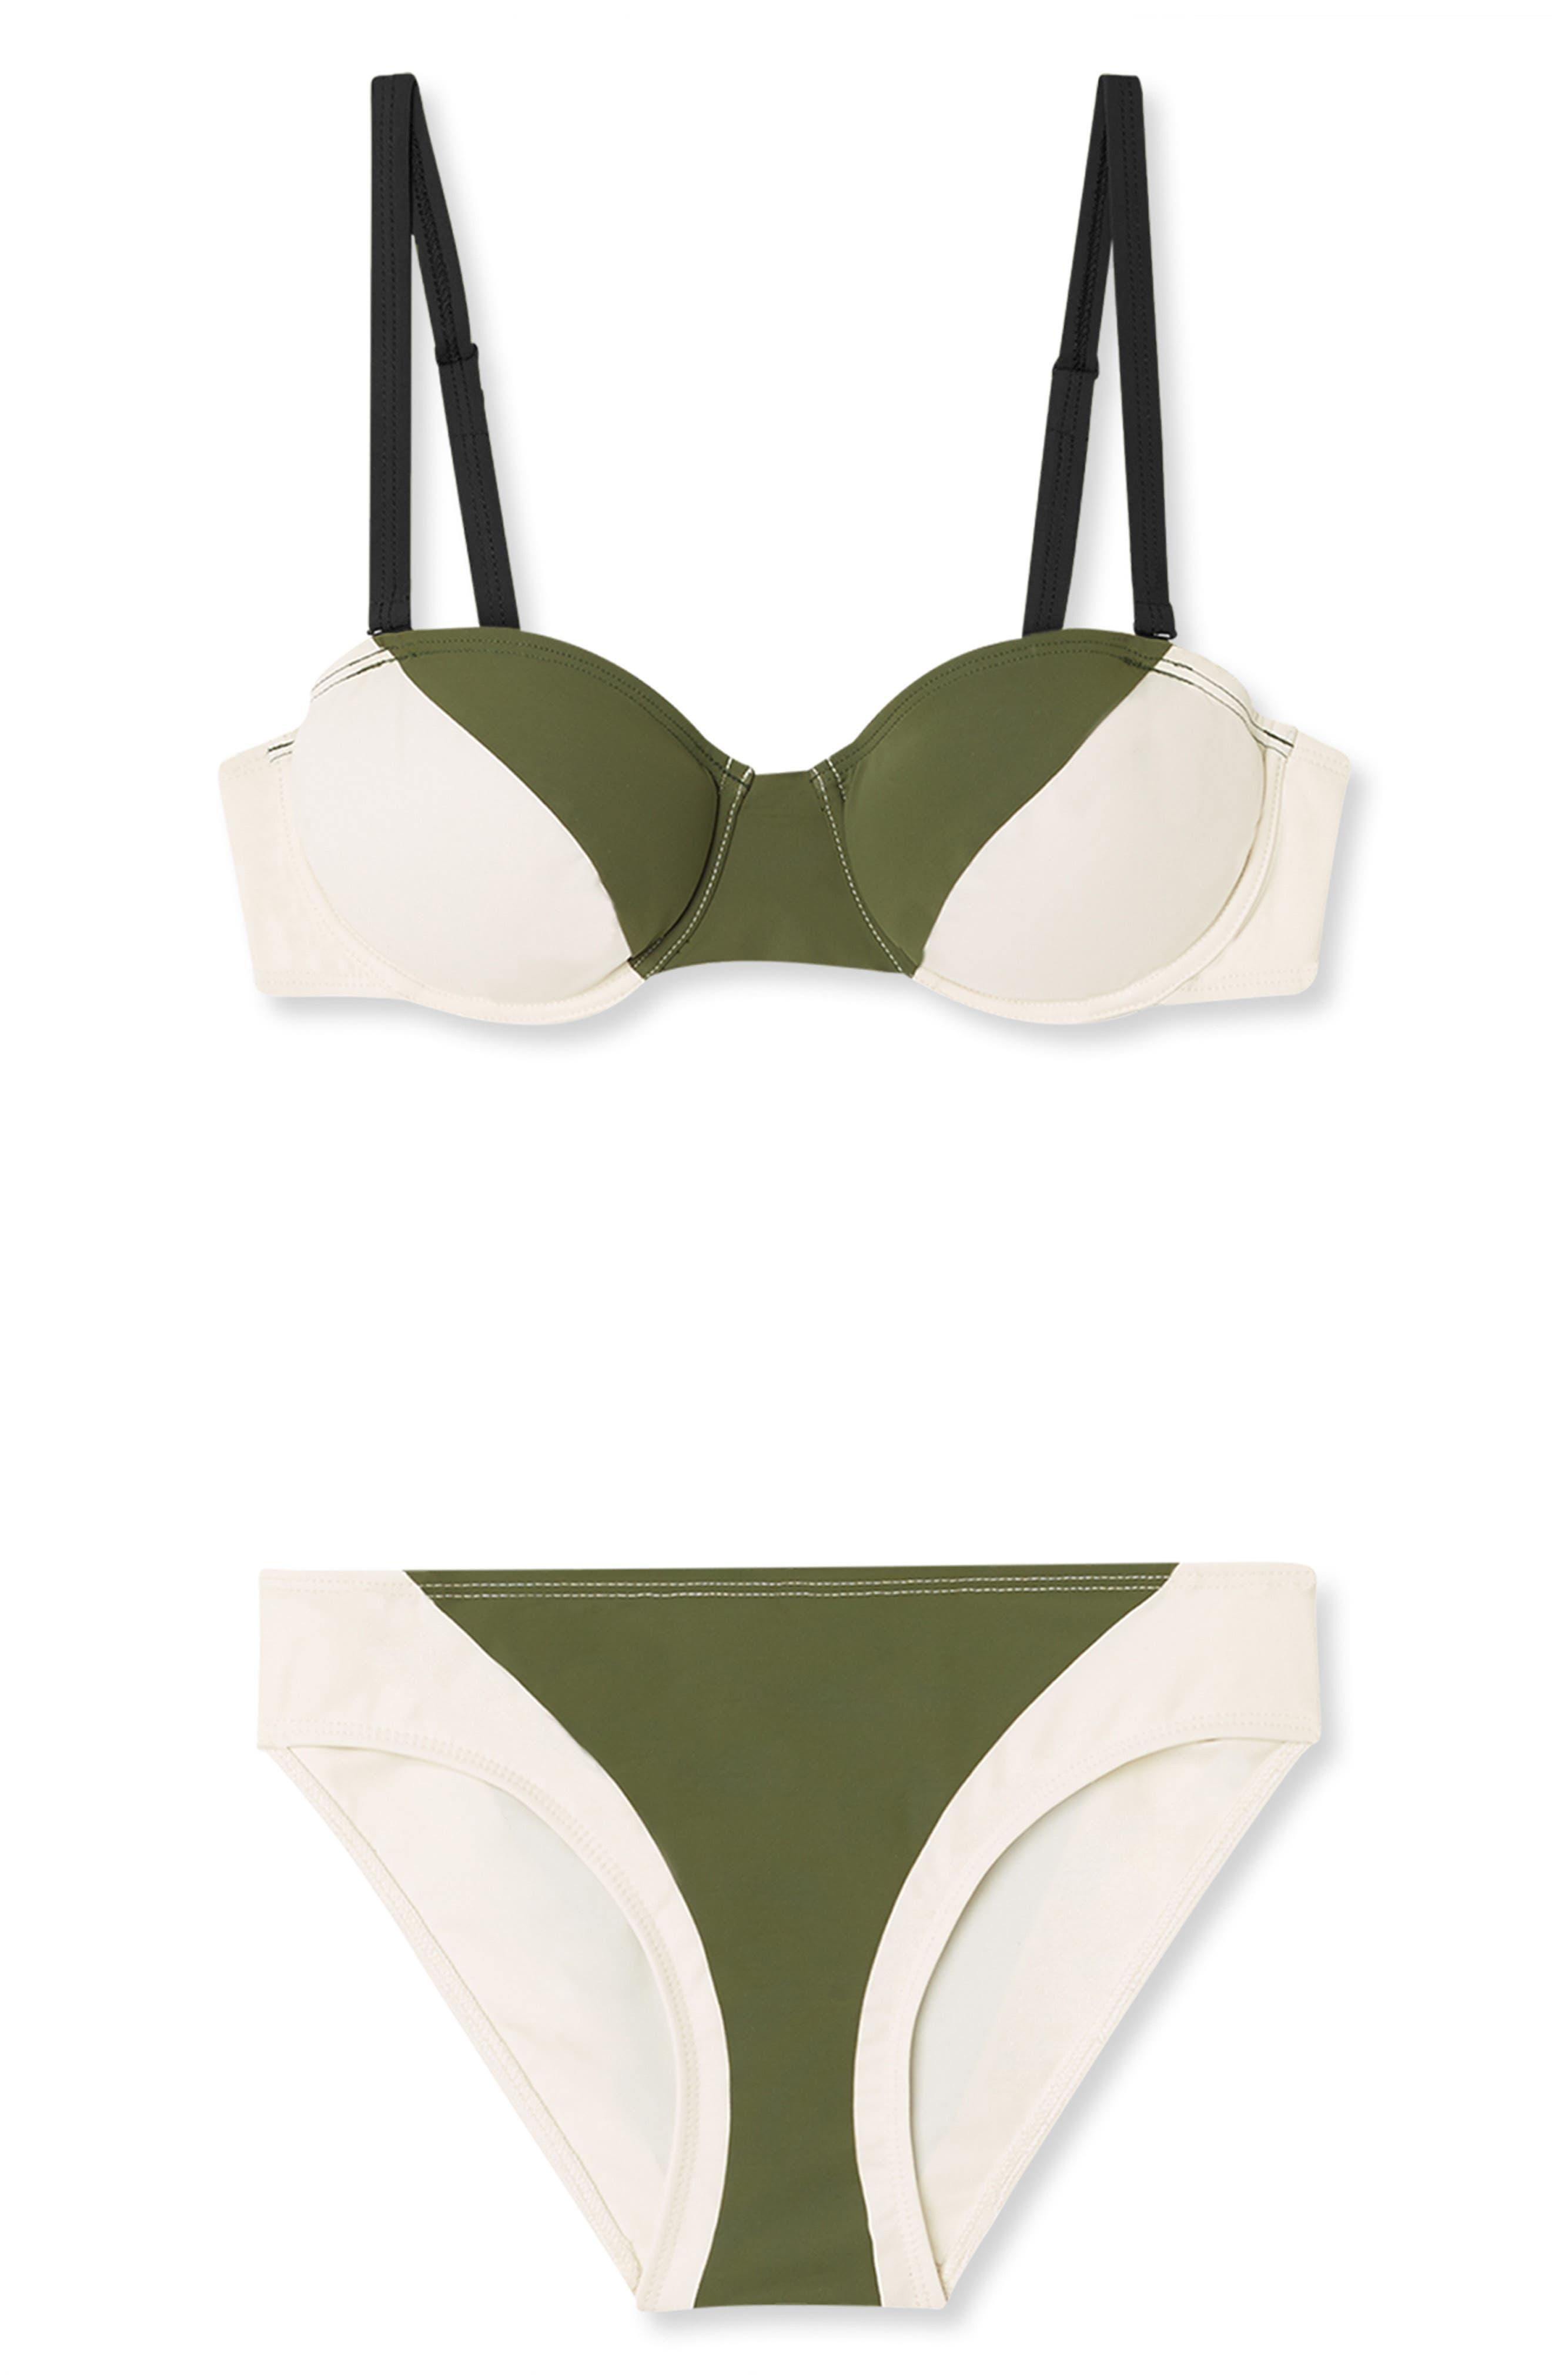 FLAGPOLE Electra Underwire Bikini Top in Olive Multi